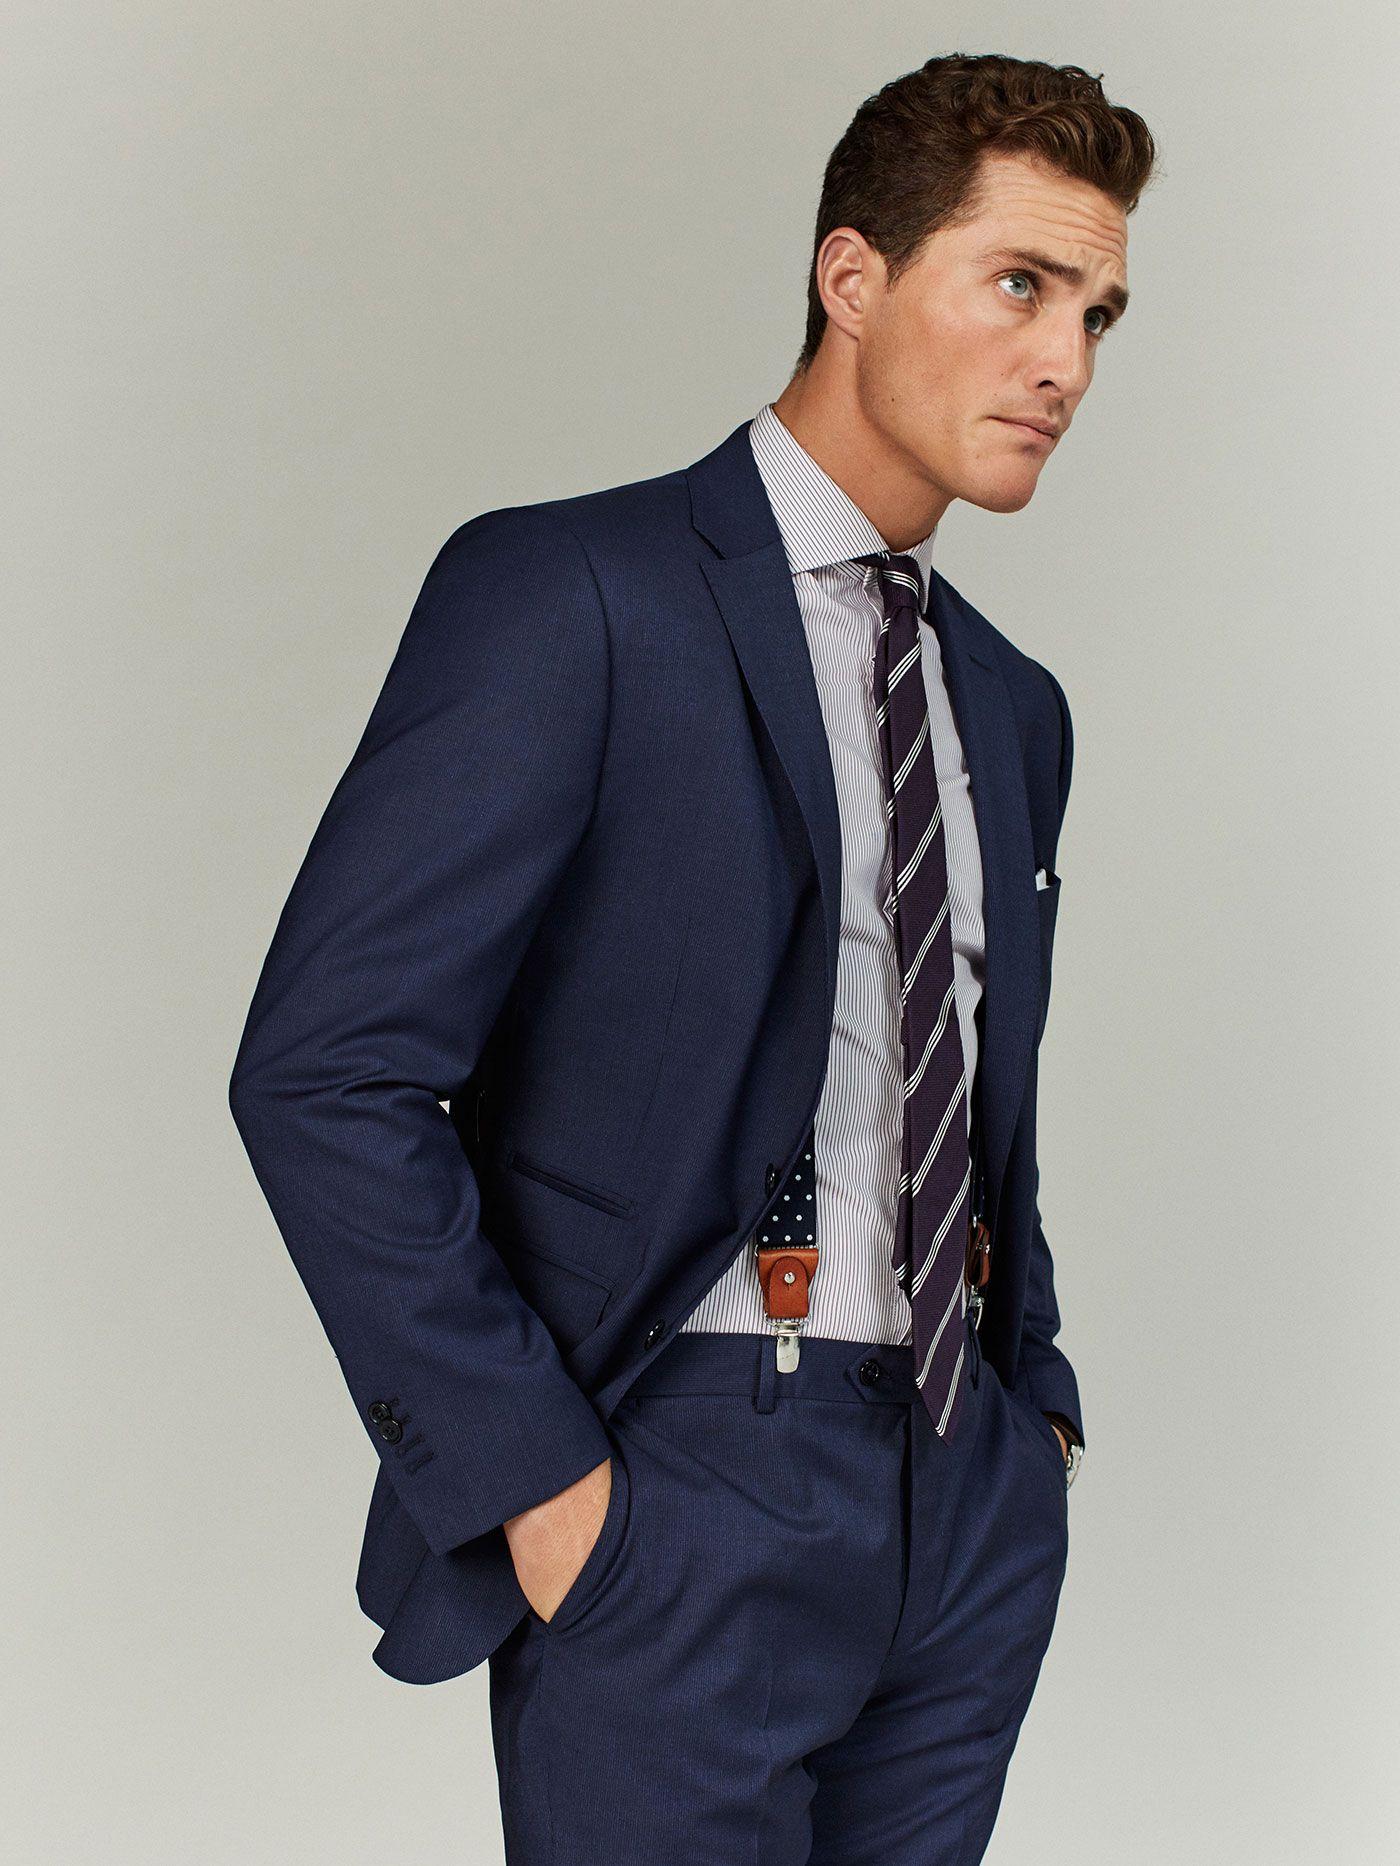 638485042525 View all - Suits - MEN - Massimo Dutti Suits - SALE - Massimo Dutti Mens